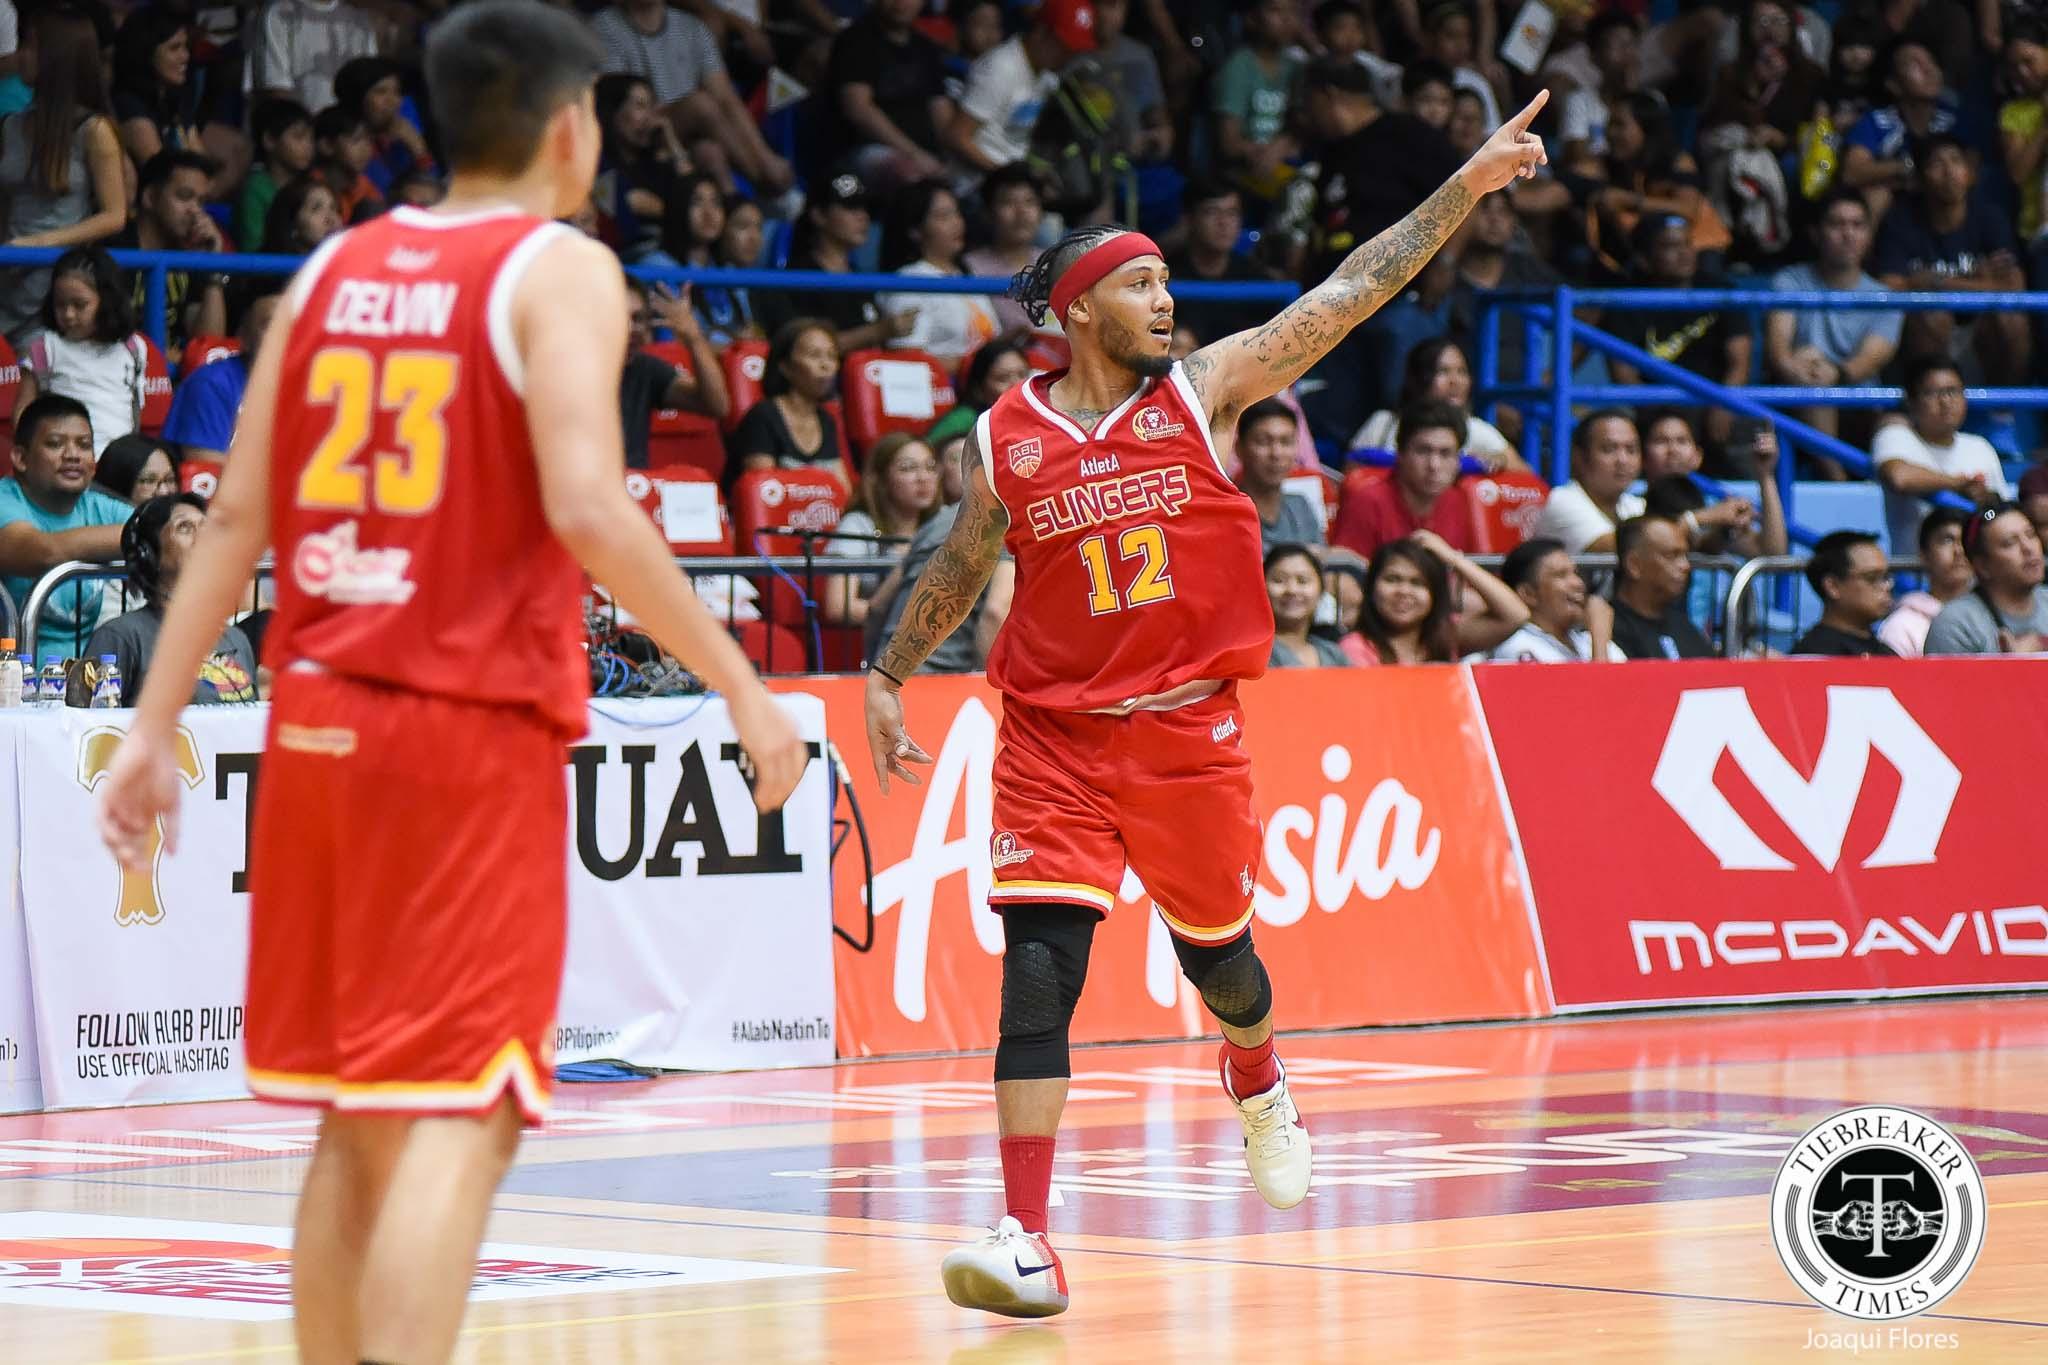 Philippine Sports News - Tiebreaker Times AJ Mandani turns Alab home game into his homecoming ABL Basketball News  Singapore Slingers AJ Mandani 2017-18 ABL Season